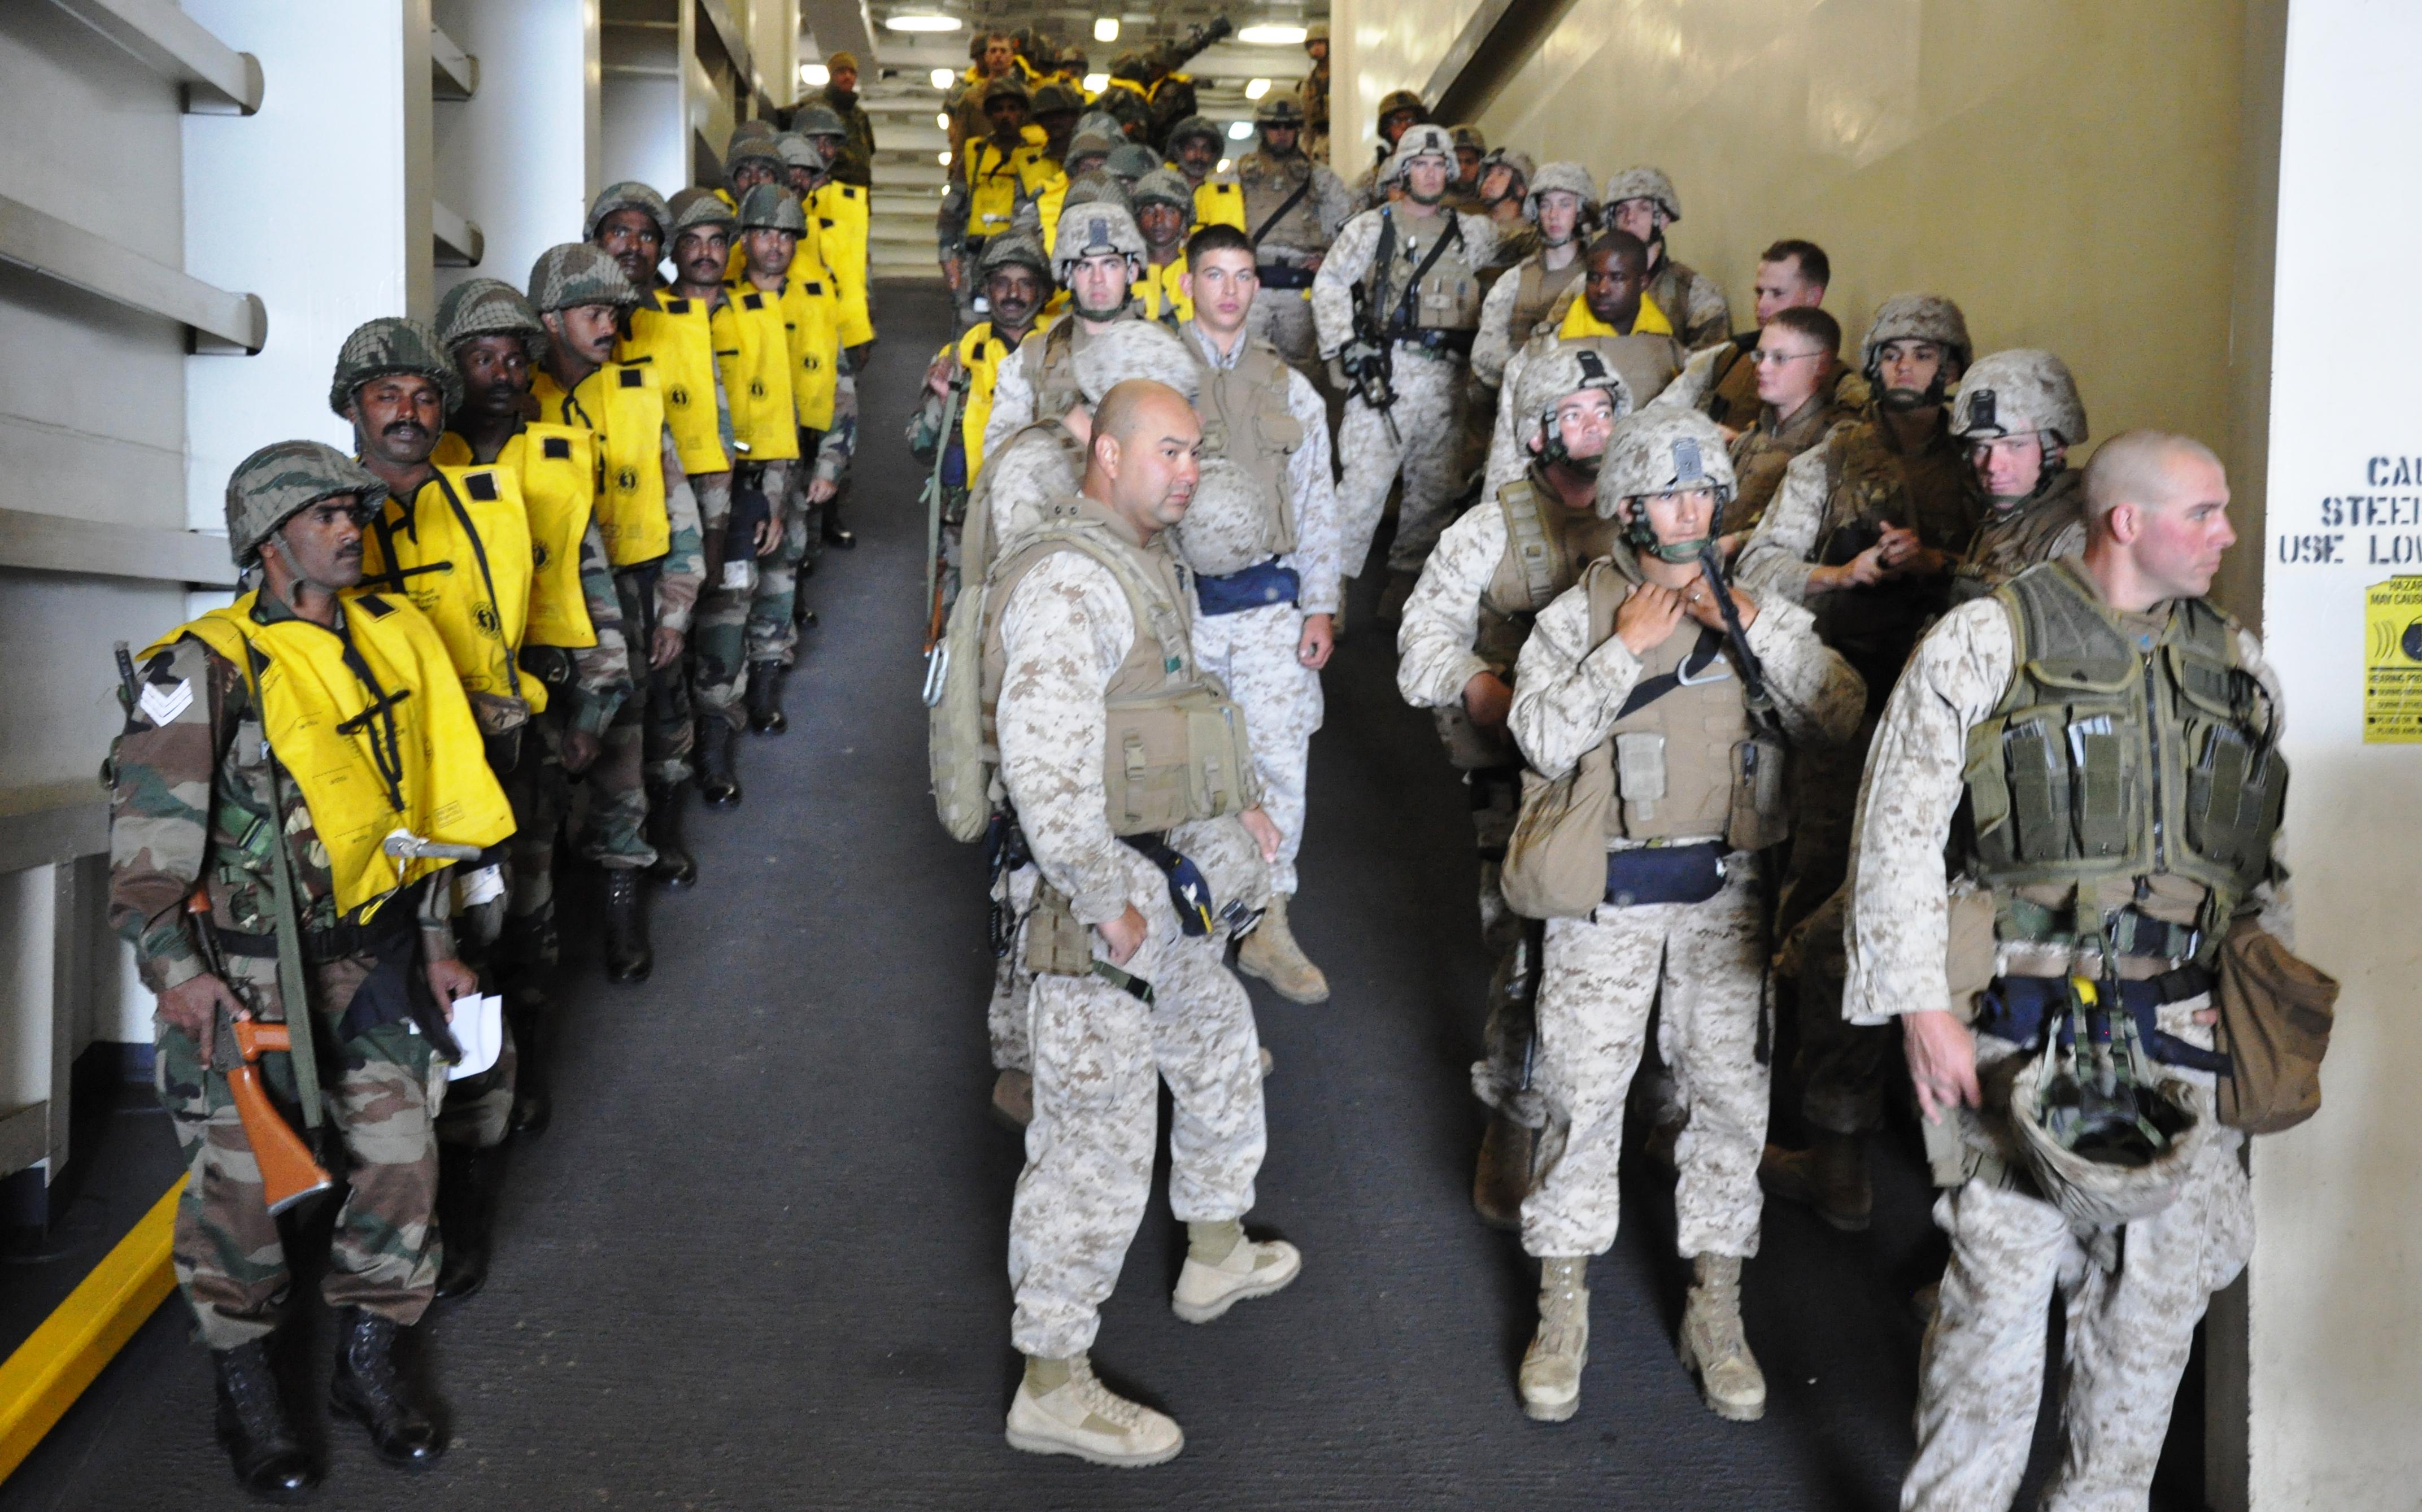 U.s Military Transport Vehicles File:US Navy 100414-N-...